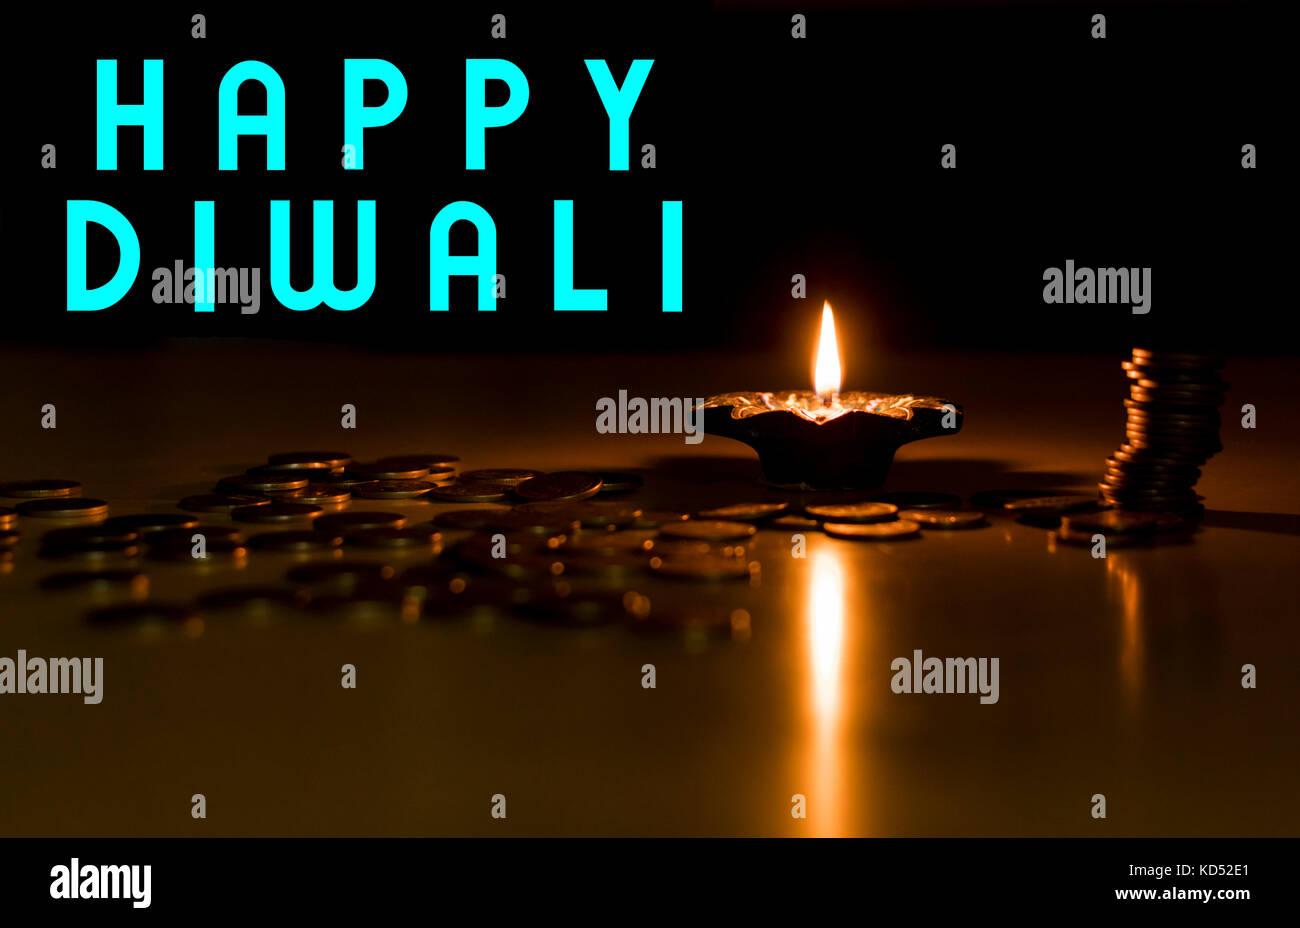 Happy Diwali Wishes And Greetings Stock Photo 162995561 Alamy